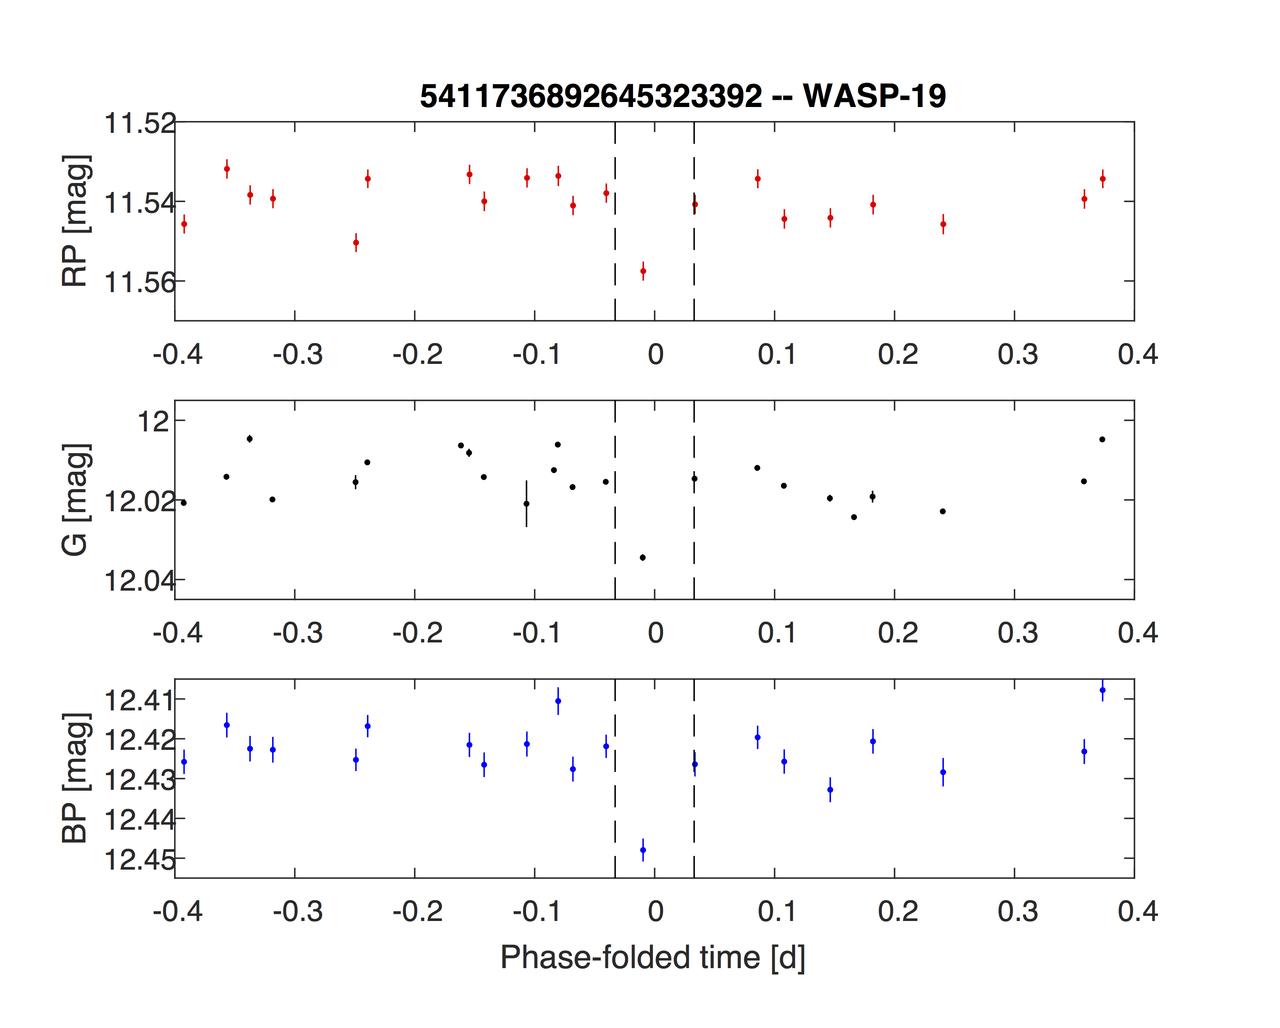 1567215191966-Gaia_WASP-19b_light_curve_1280.jpg